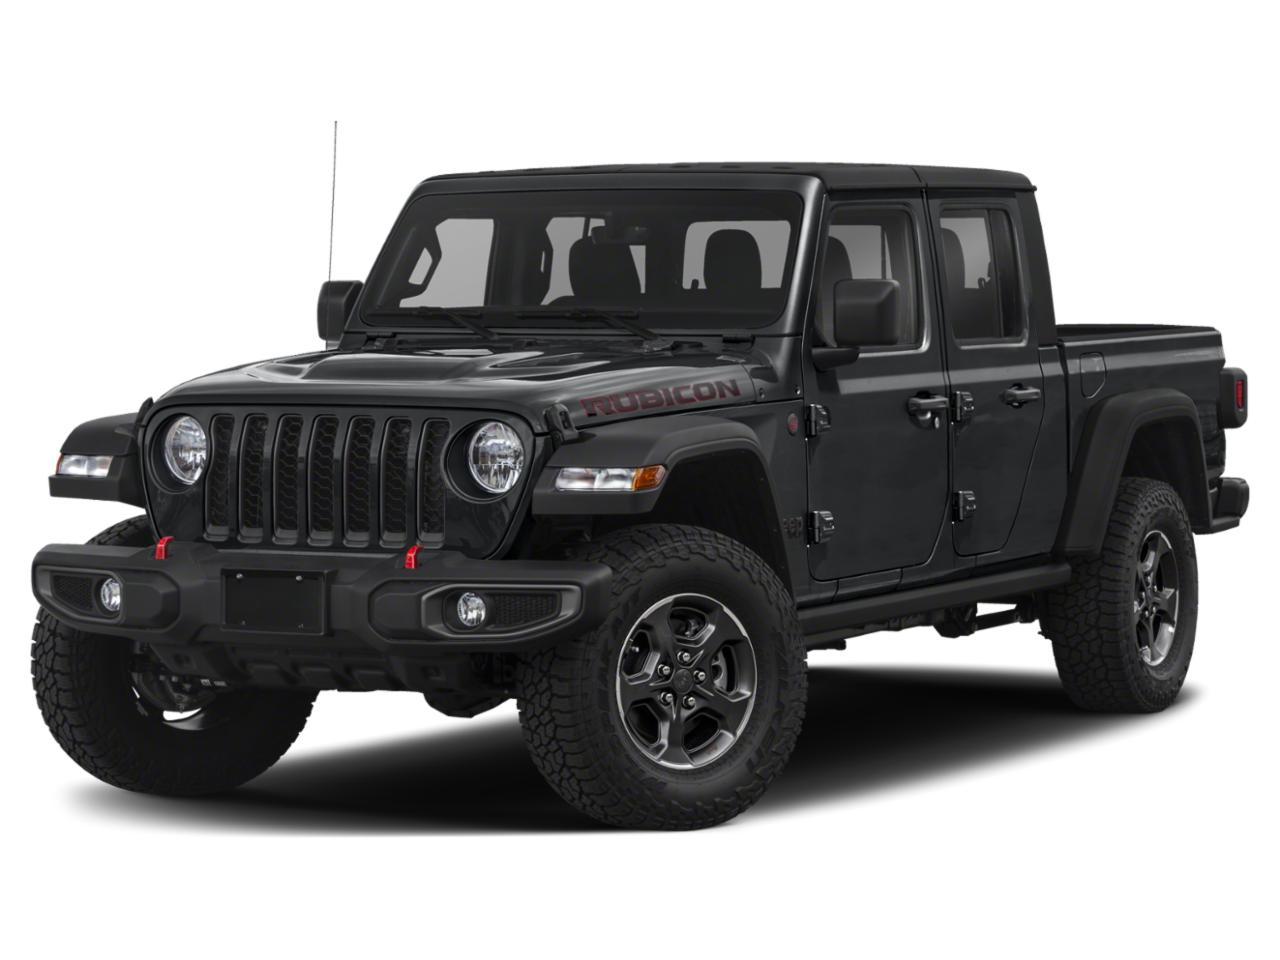 2021 Jeep Gladiator Vehicle Photo in Kaukauna, WI 54130